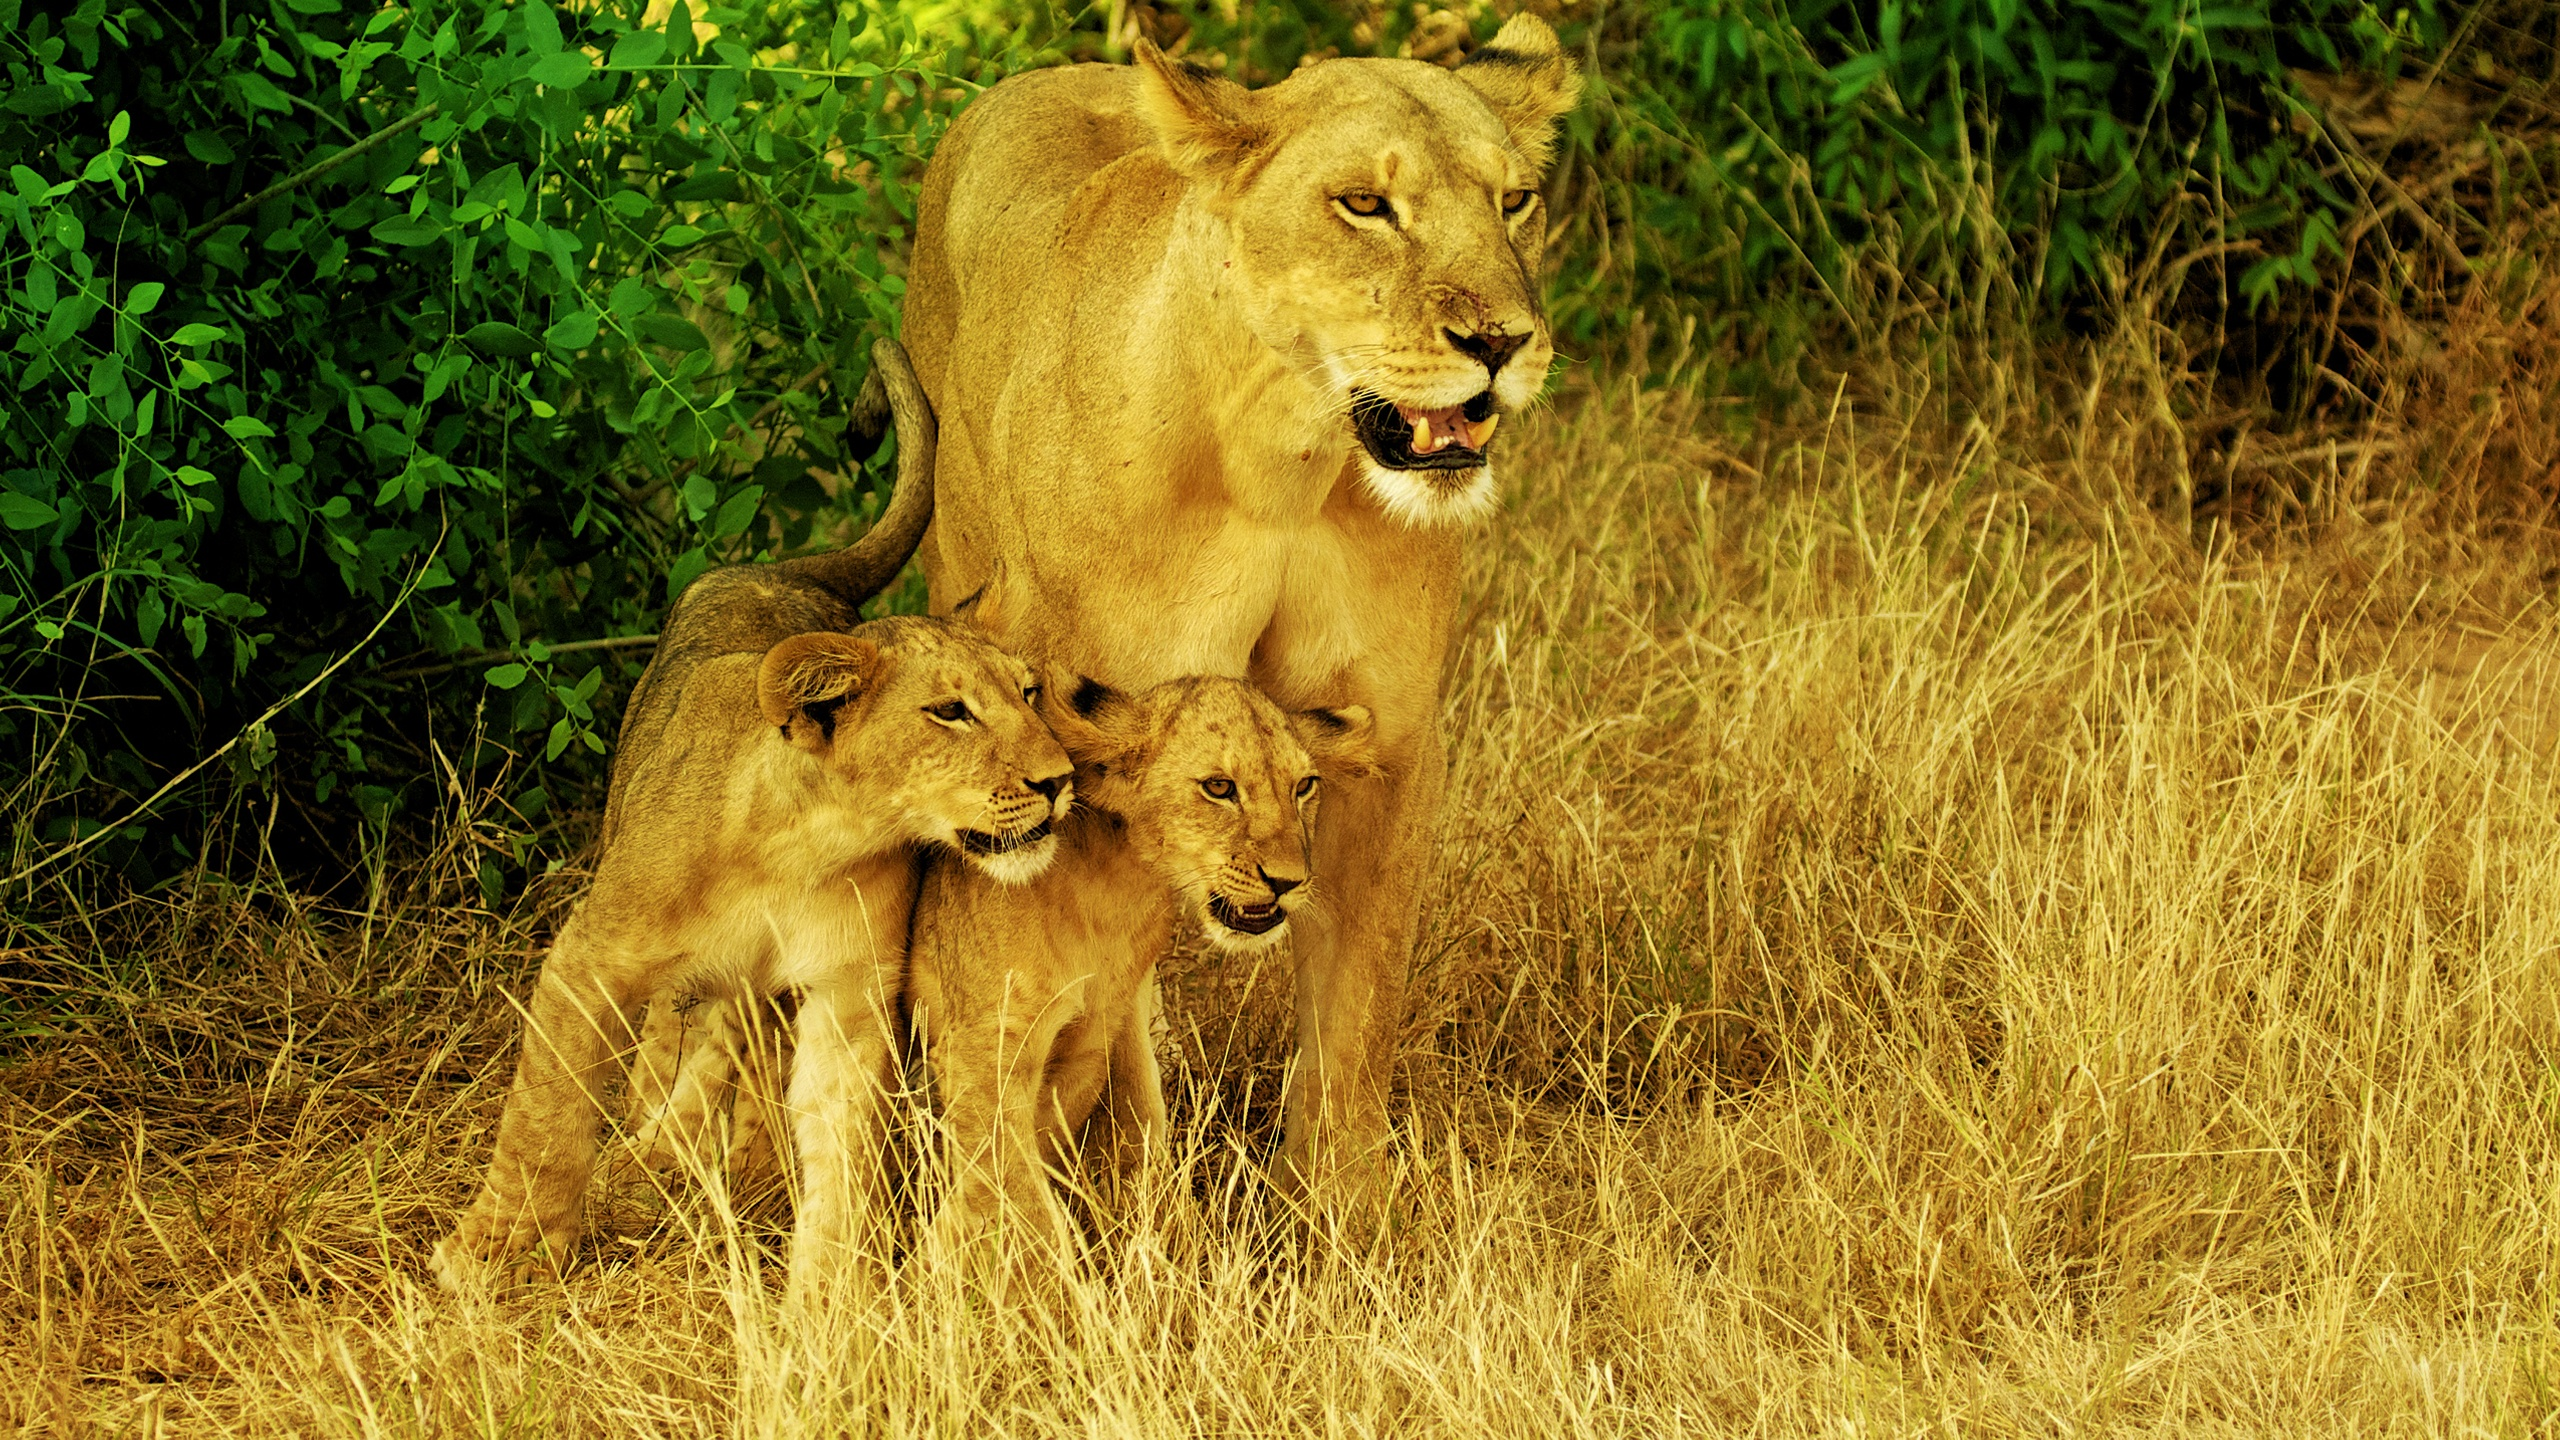 Lion family wallpaper - photo#9